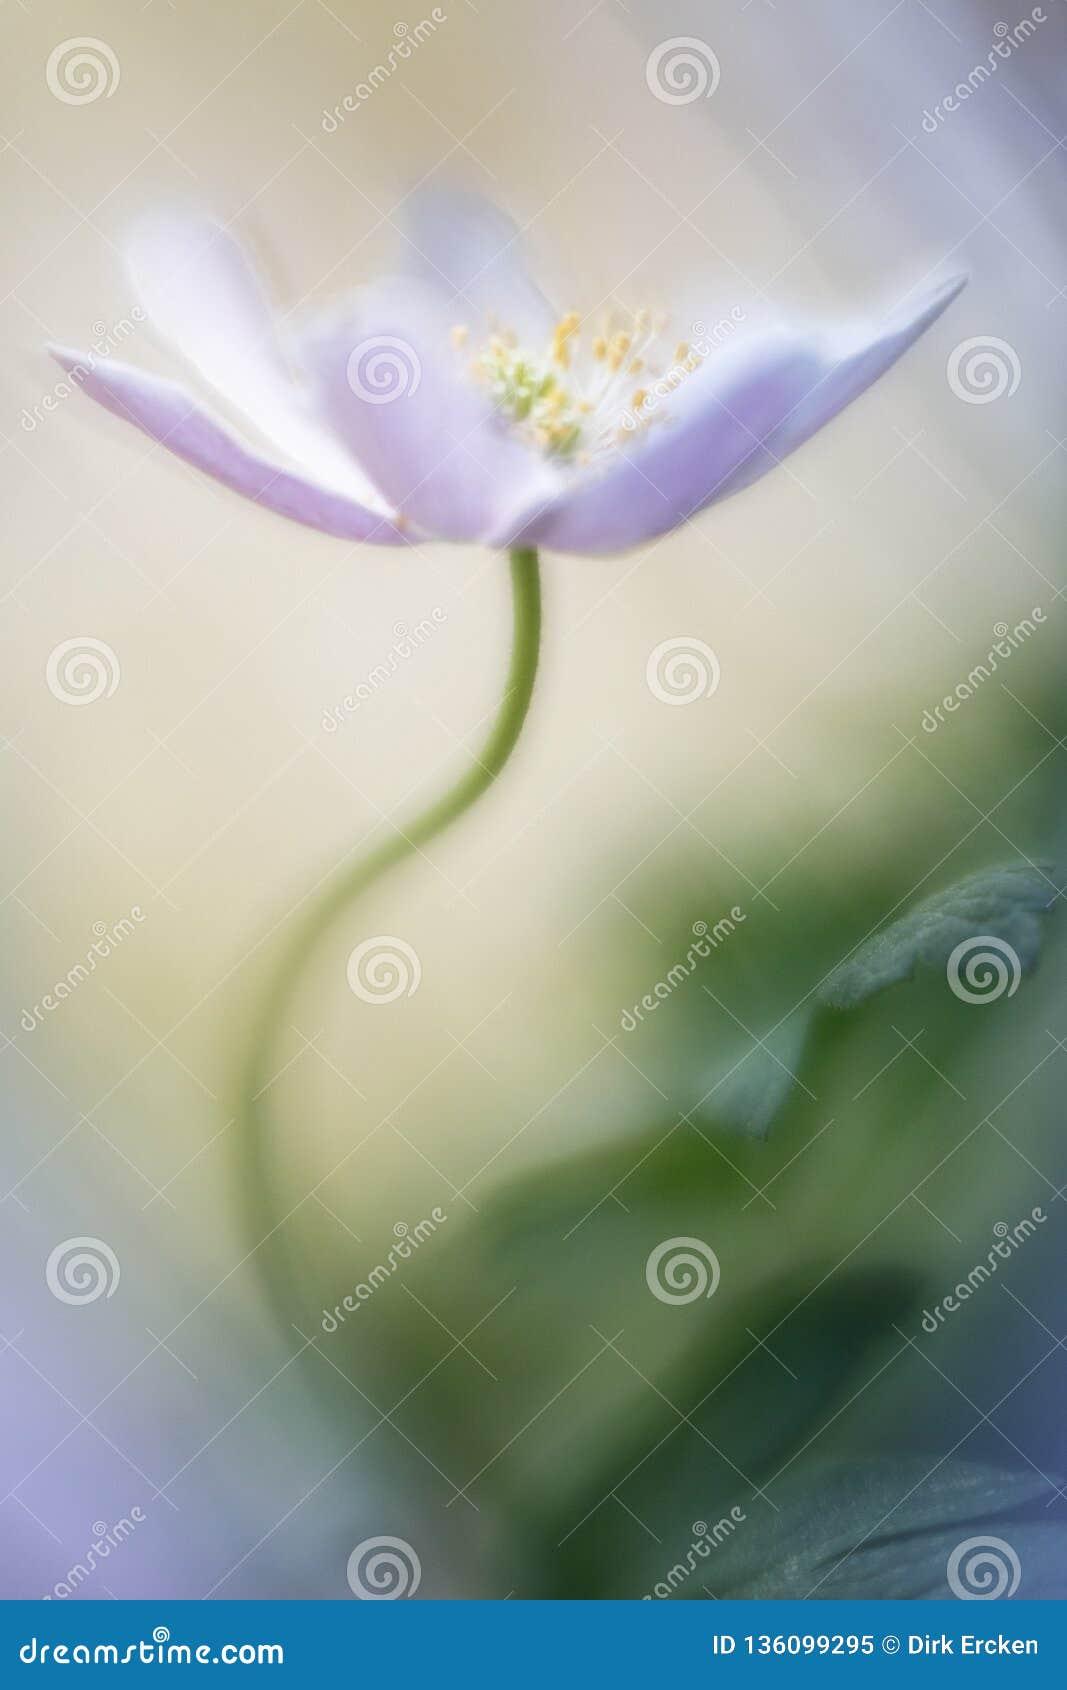 Single white wild flower, a wood anemone